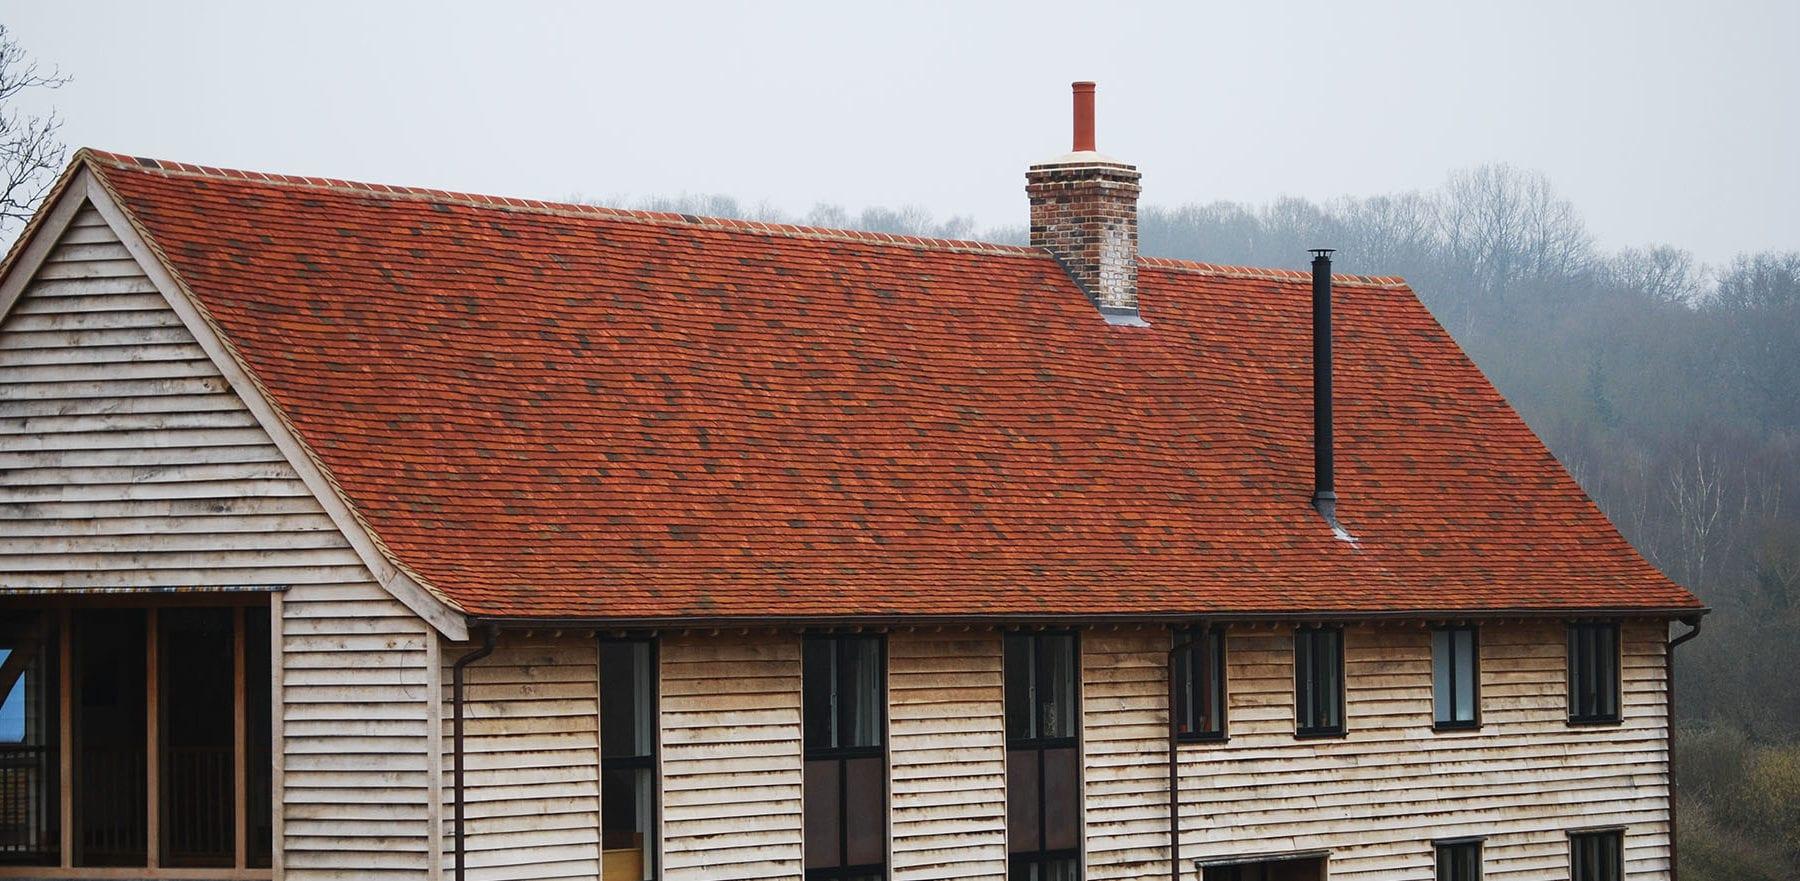 Lifestiles - Handmade Multi Clay Roof Tiles - Sible, England 2